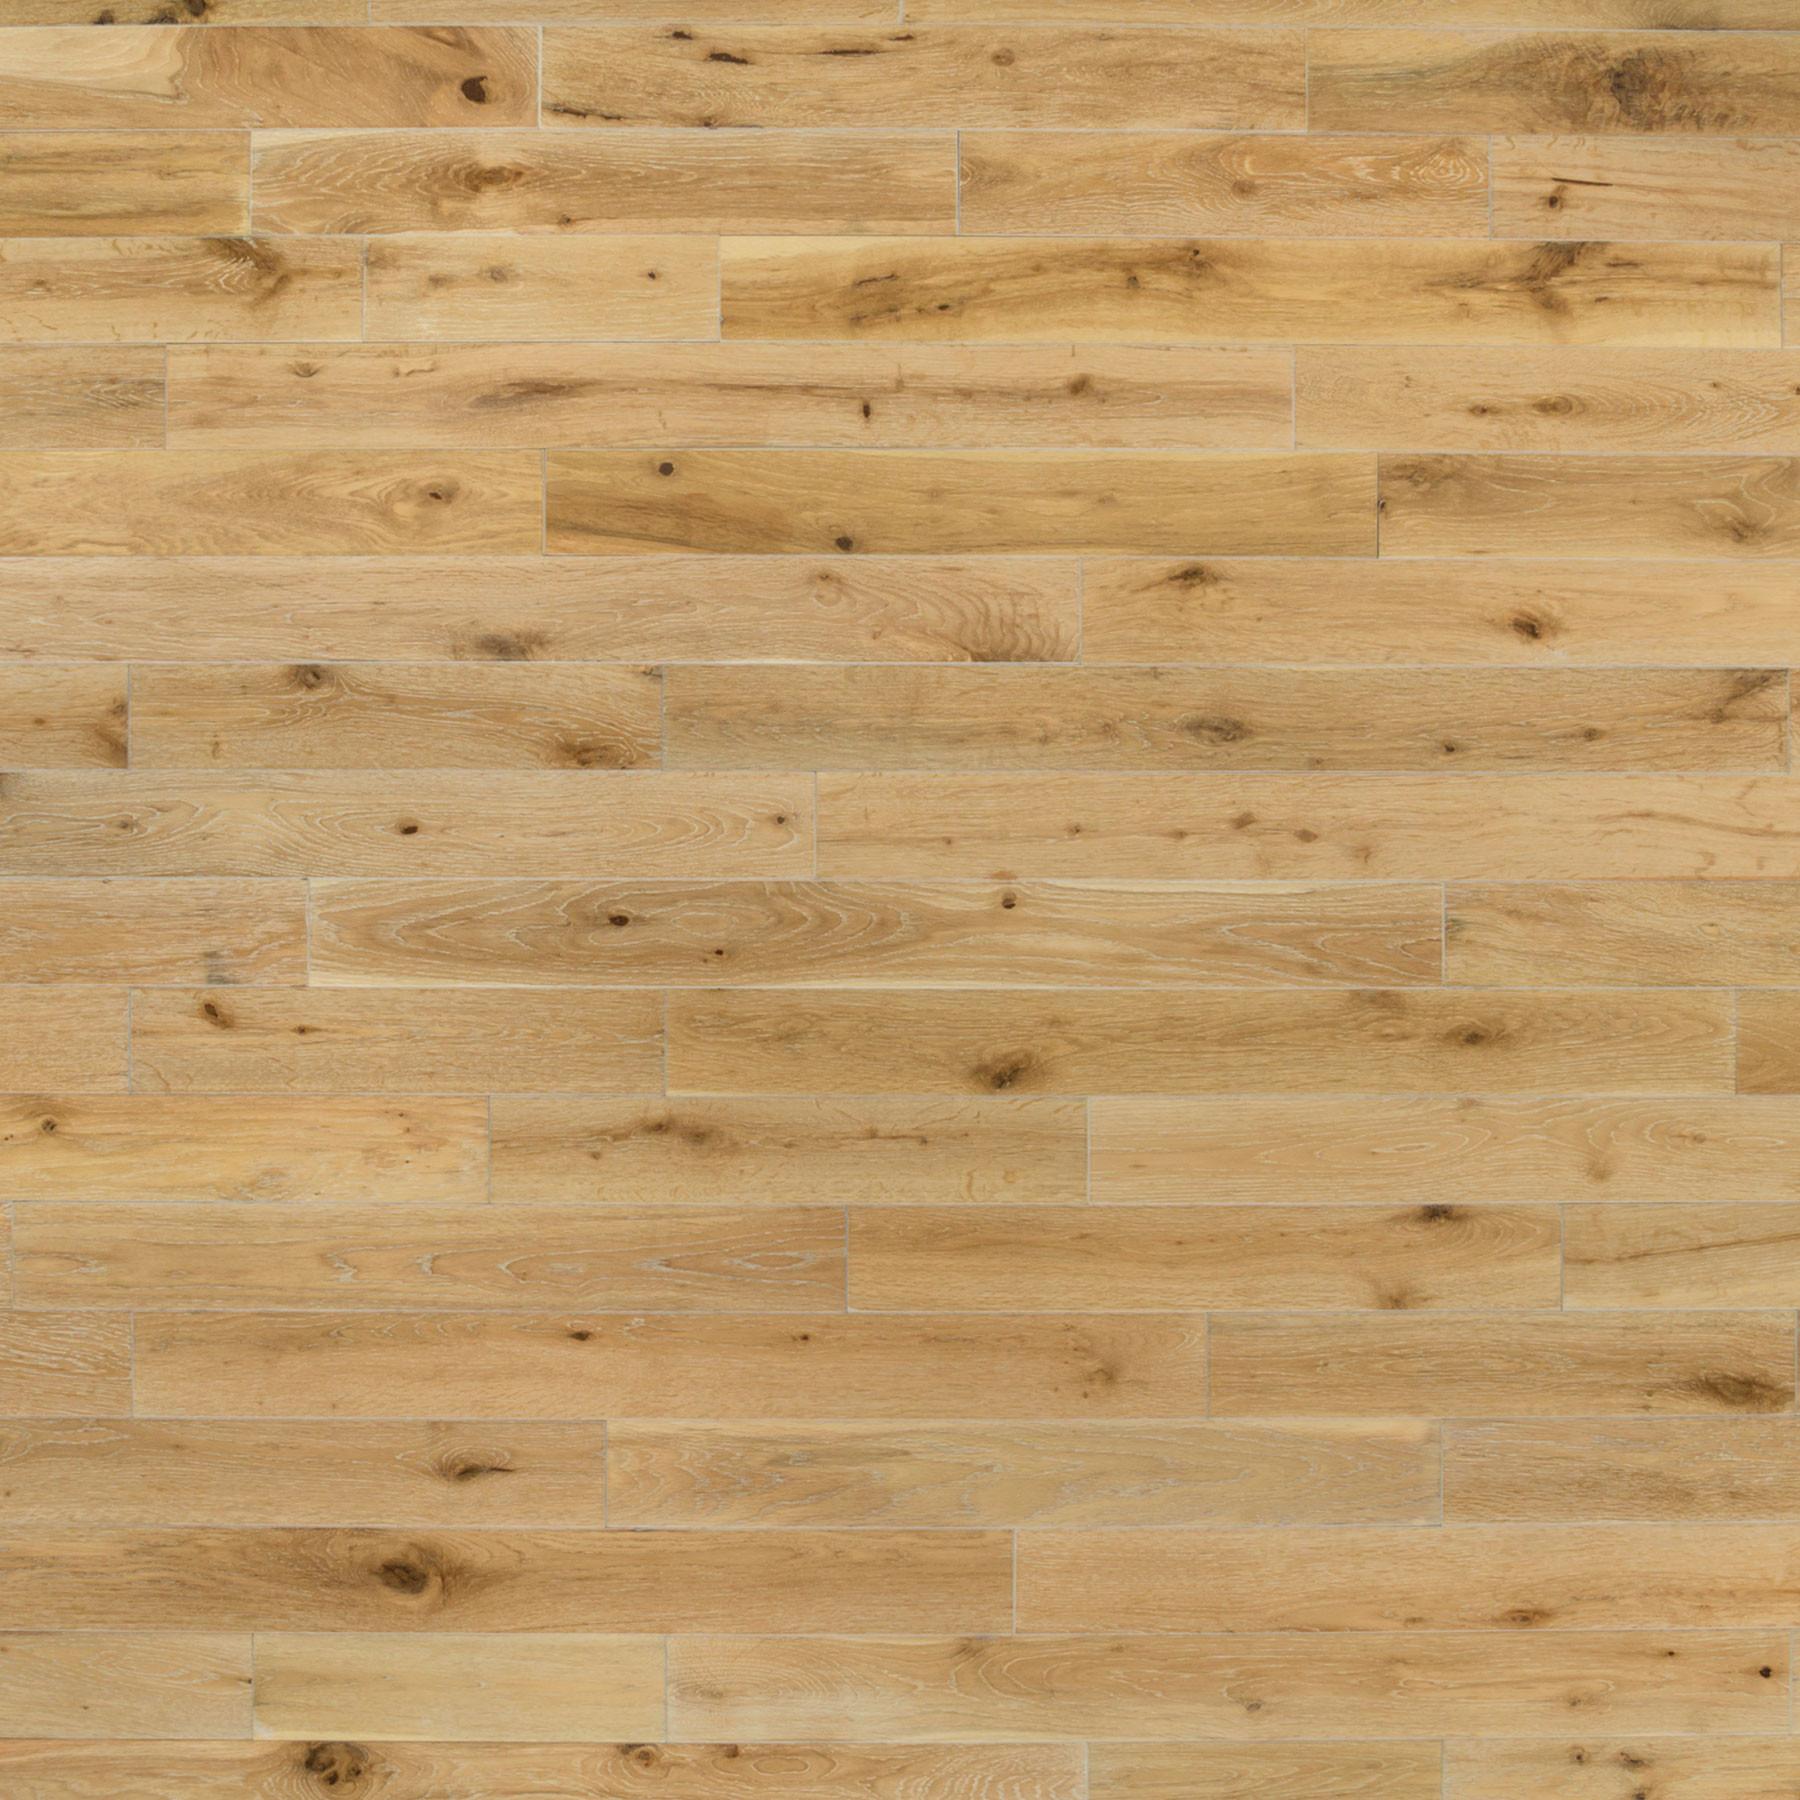 bamboo hardwood flooring vs oak of harbor oak 3 1 2″ white oak white washed etx surfaces in harbor oak 3 1 2″ white oak white washed